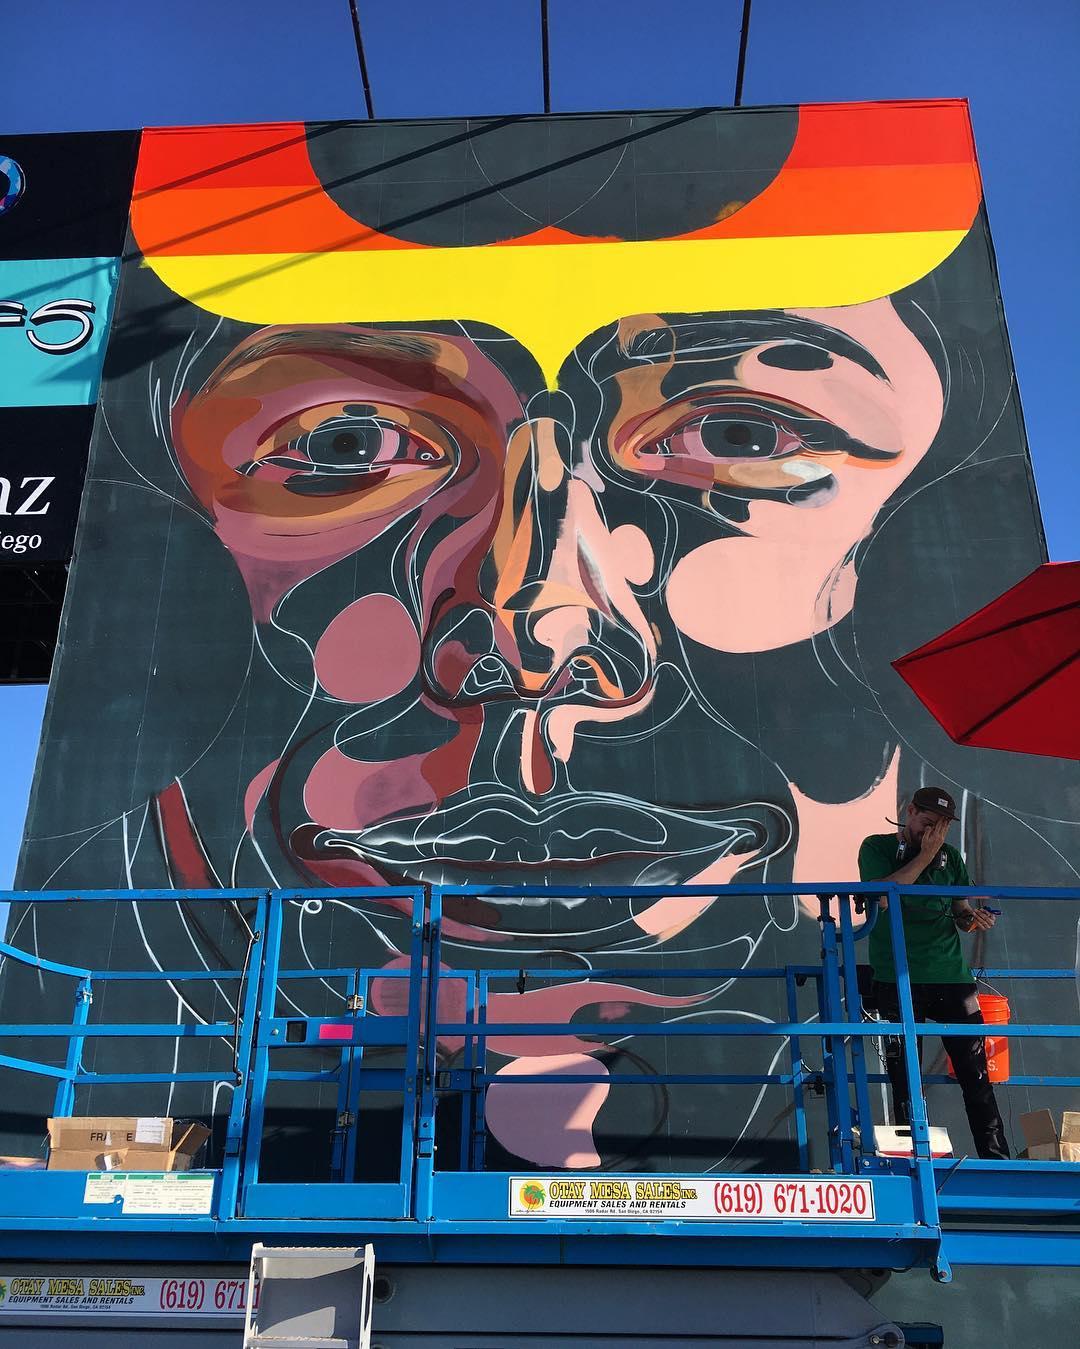 @vanstheomega live at @kaaboodelmar #kaabooartwork • • #California #Spratx #vanstheomega #liveart #art #mural #music #kaaboodelmar